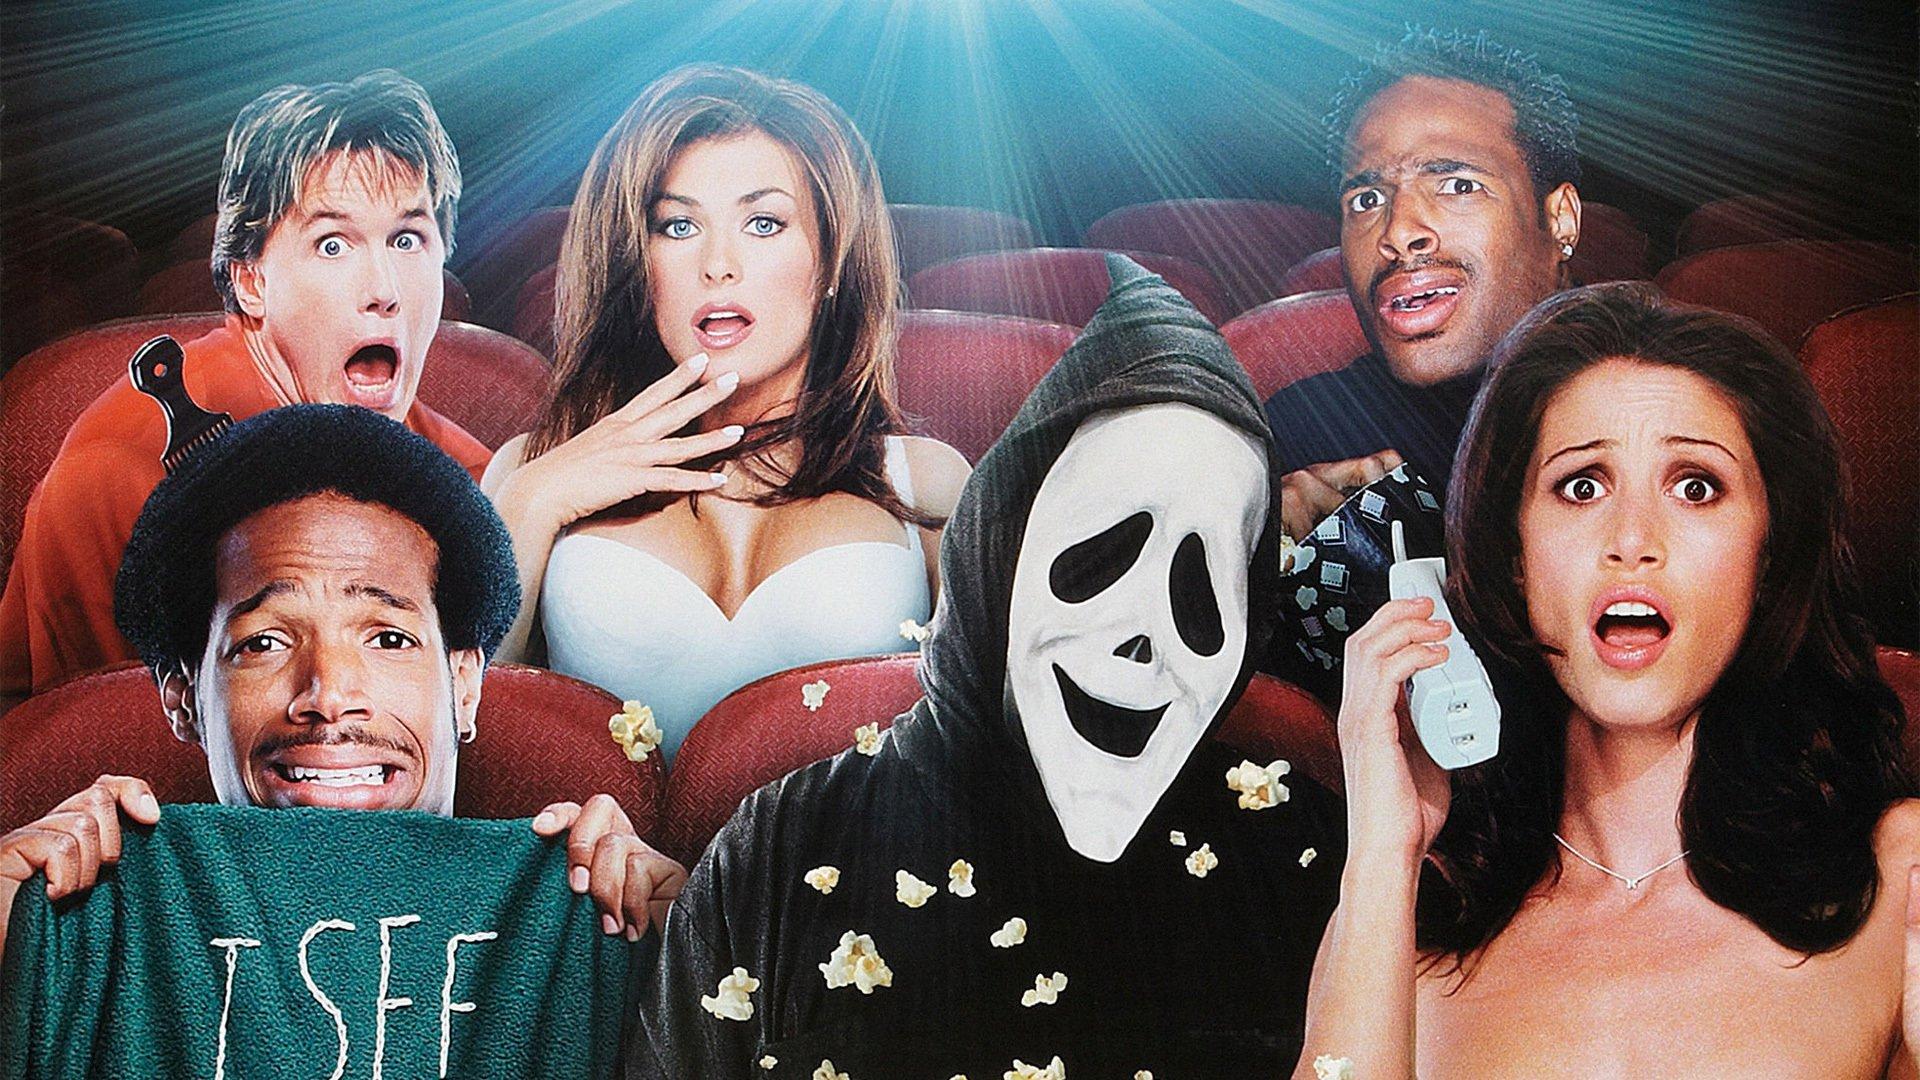 cinema-film-top-raisons-de-voir-harold-et-kumar-scary-movie